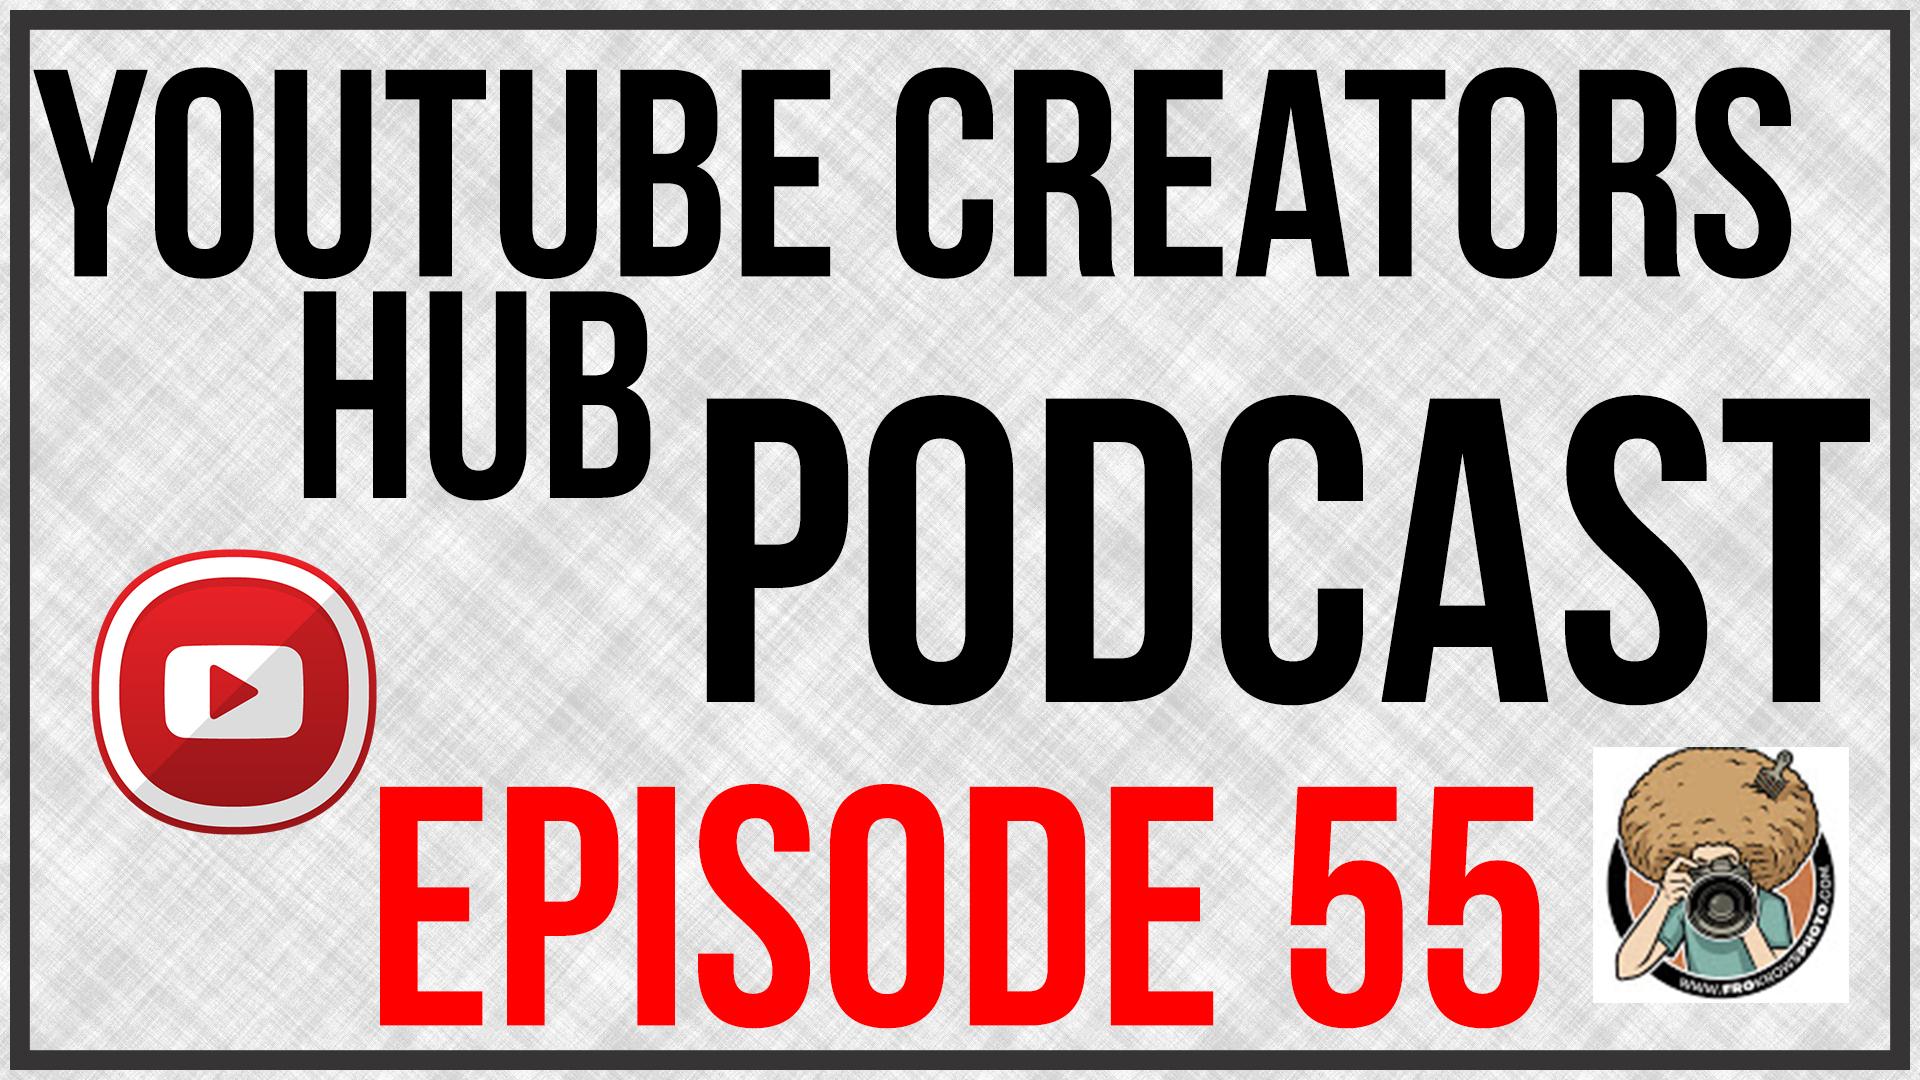 YouTube Creators Hub Podcast Episode 55